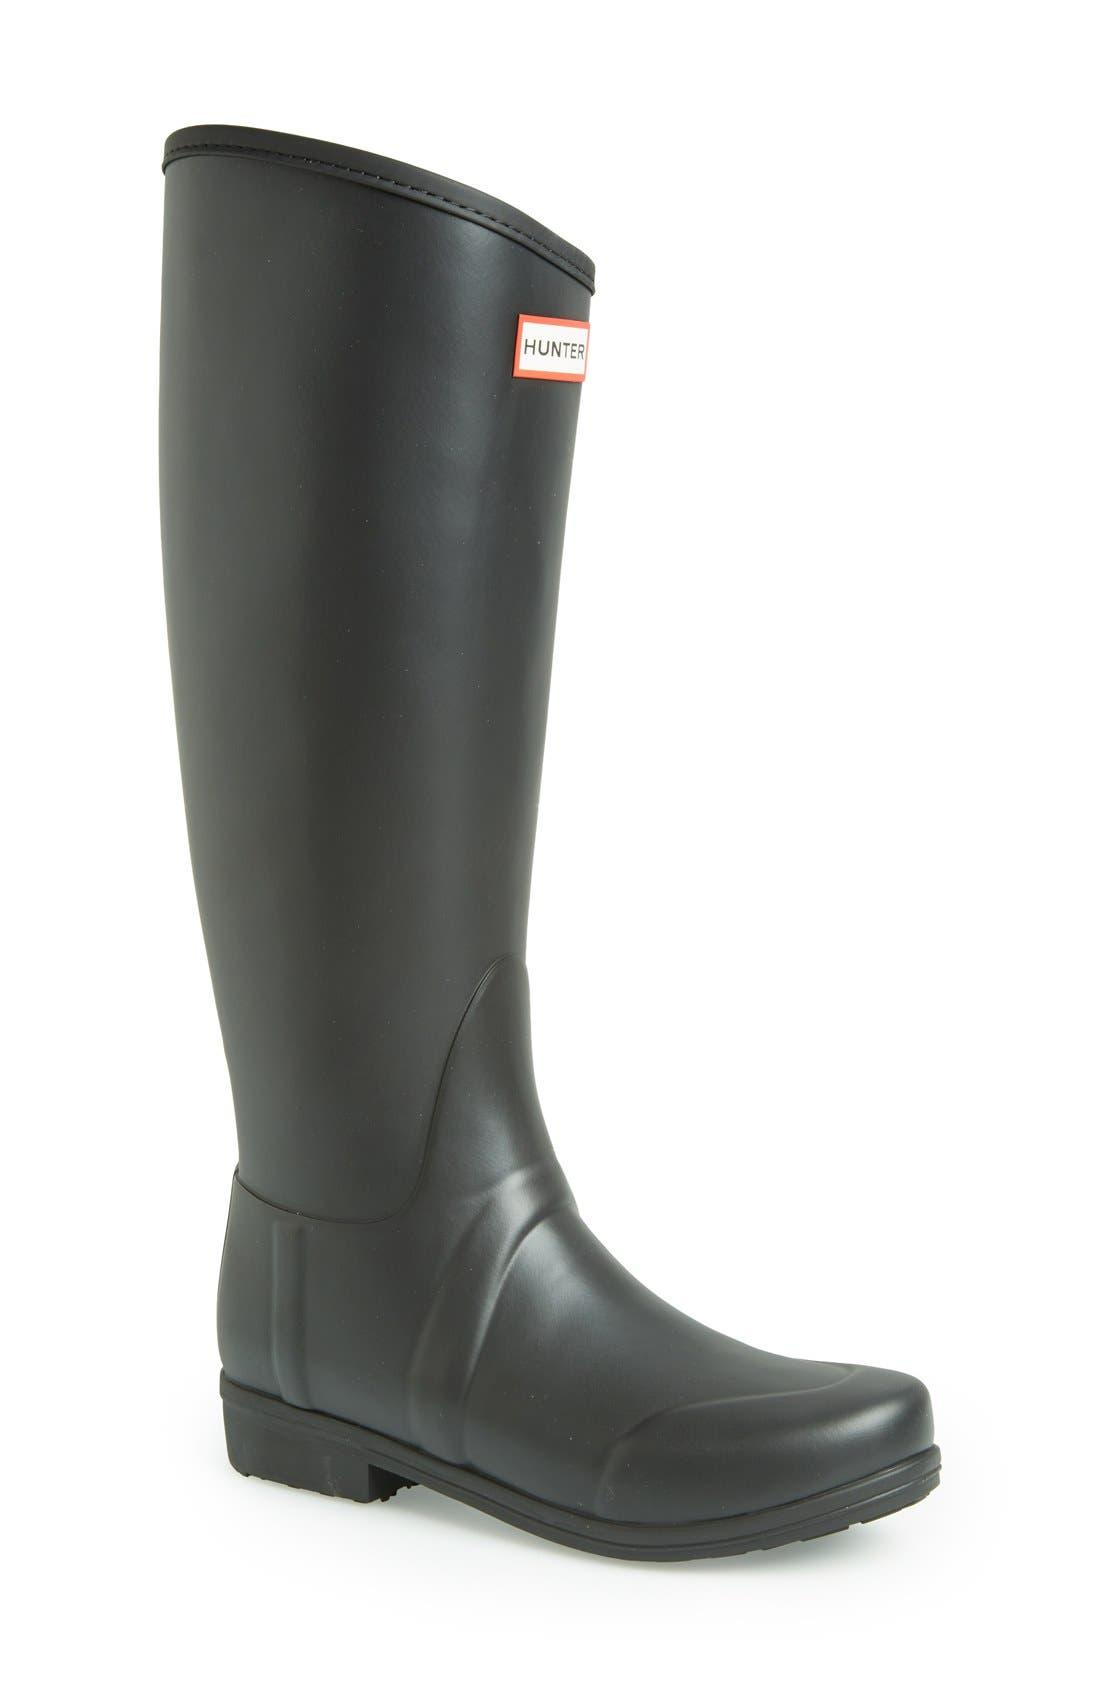 Main Image - Hunter 'Sandhurst' Tall Rain Boot (Women)